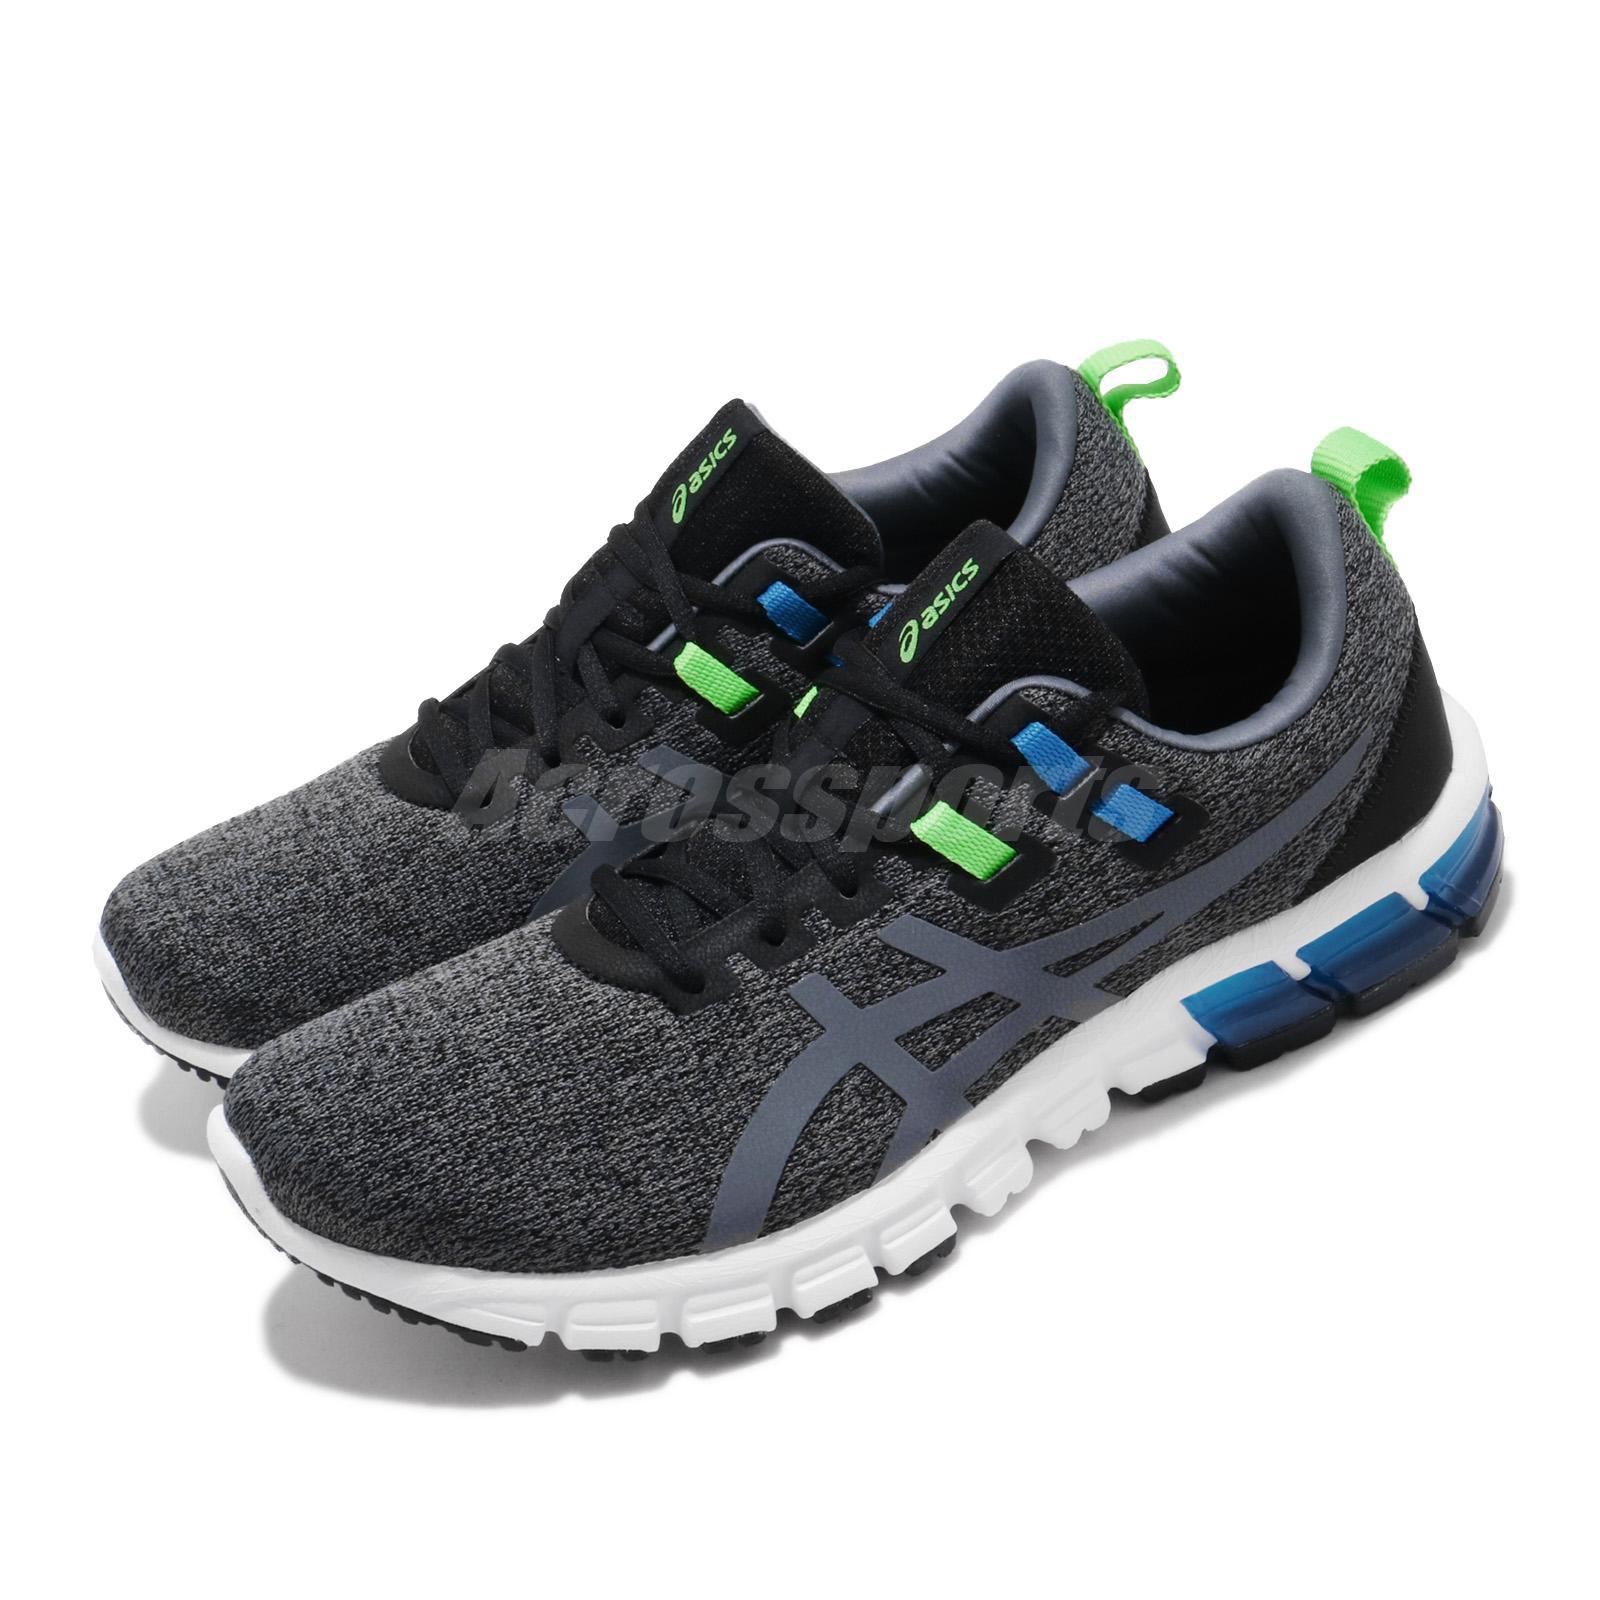 puramente Portero Automático  Asics Gel-Quantum 90 Grey Blue Green White Men Running Shoe Sneaker 1021A123-024  | eBay